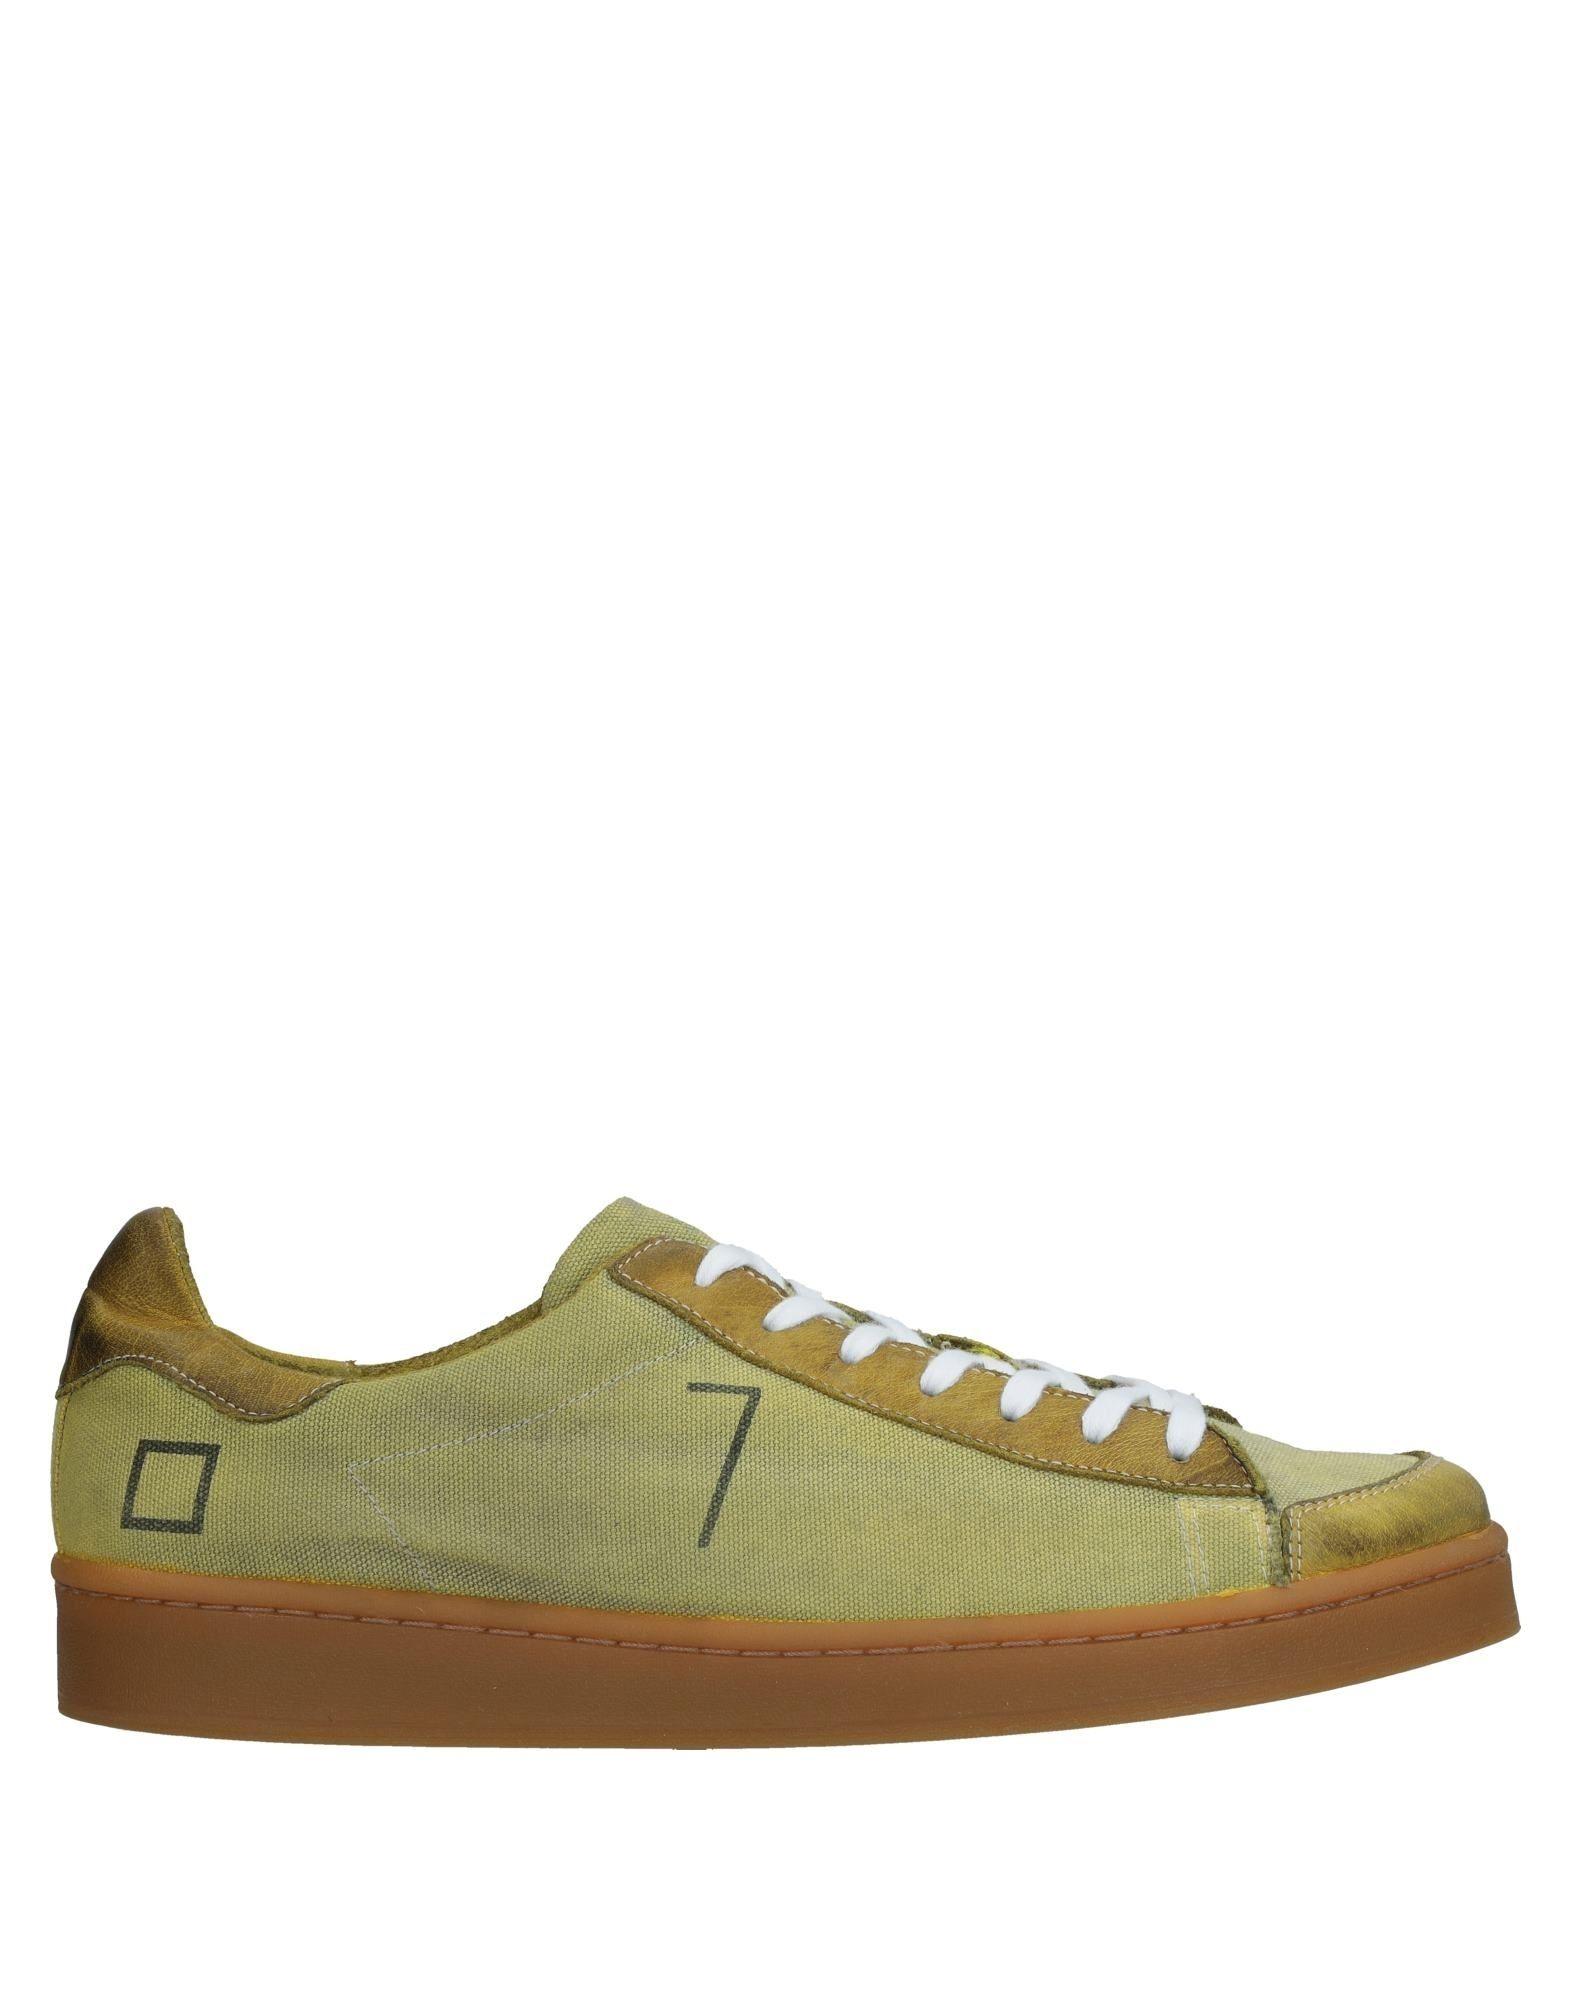 Sneakers D.A.T.E. X Eral 55 Uomo - 11519298DM